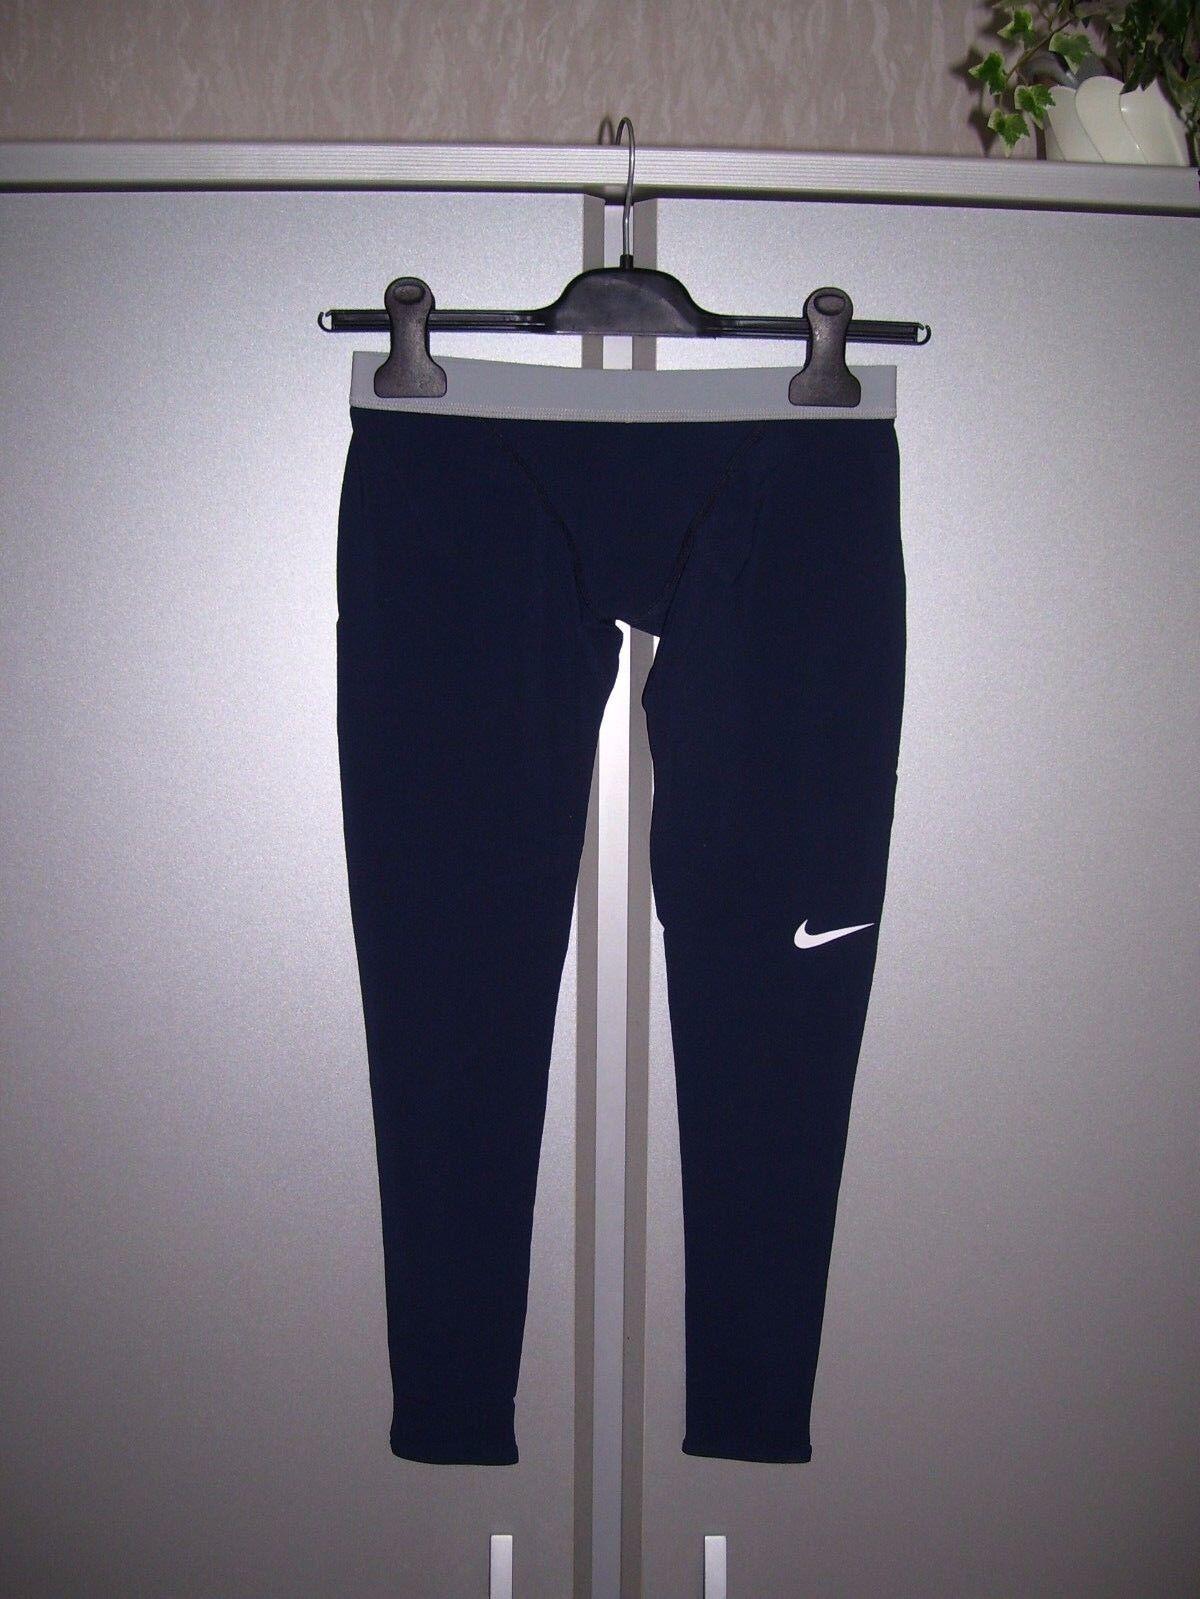 Nike Jungen Badehose lang Badeshort Jammer Schwimmhose navy langes Bein 152 neu